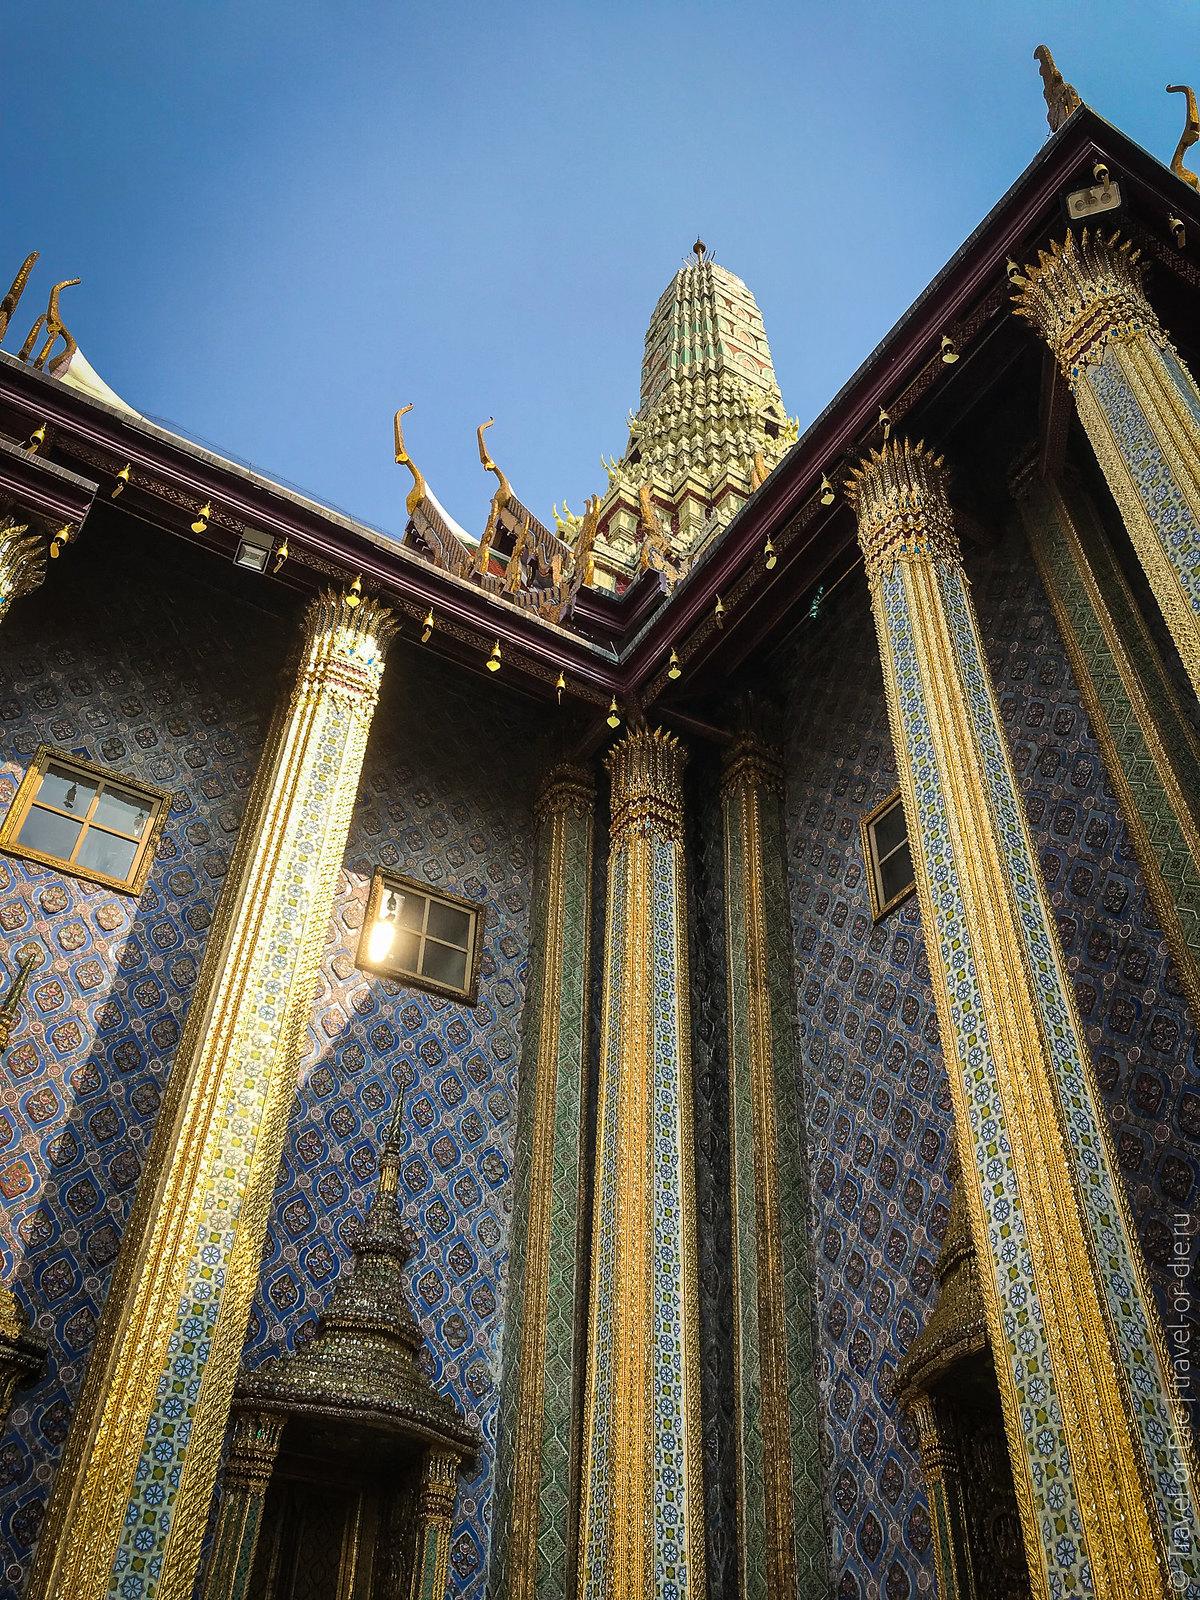 Grand-Palace-Bangkok-Королевский-дворец-Бангкок-9183